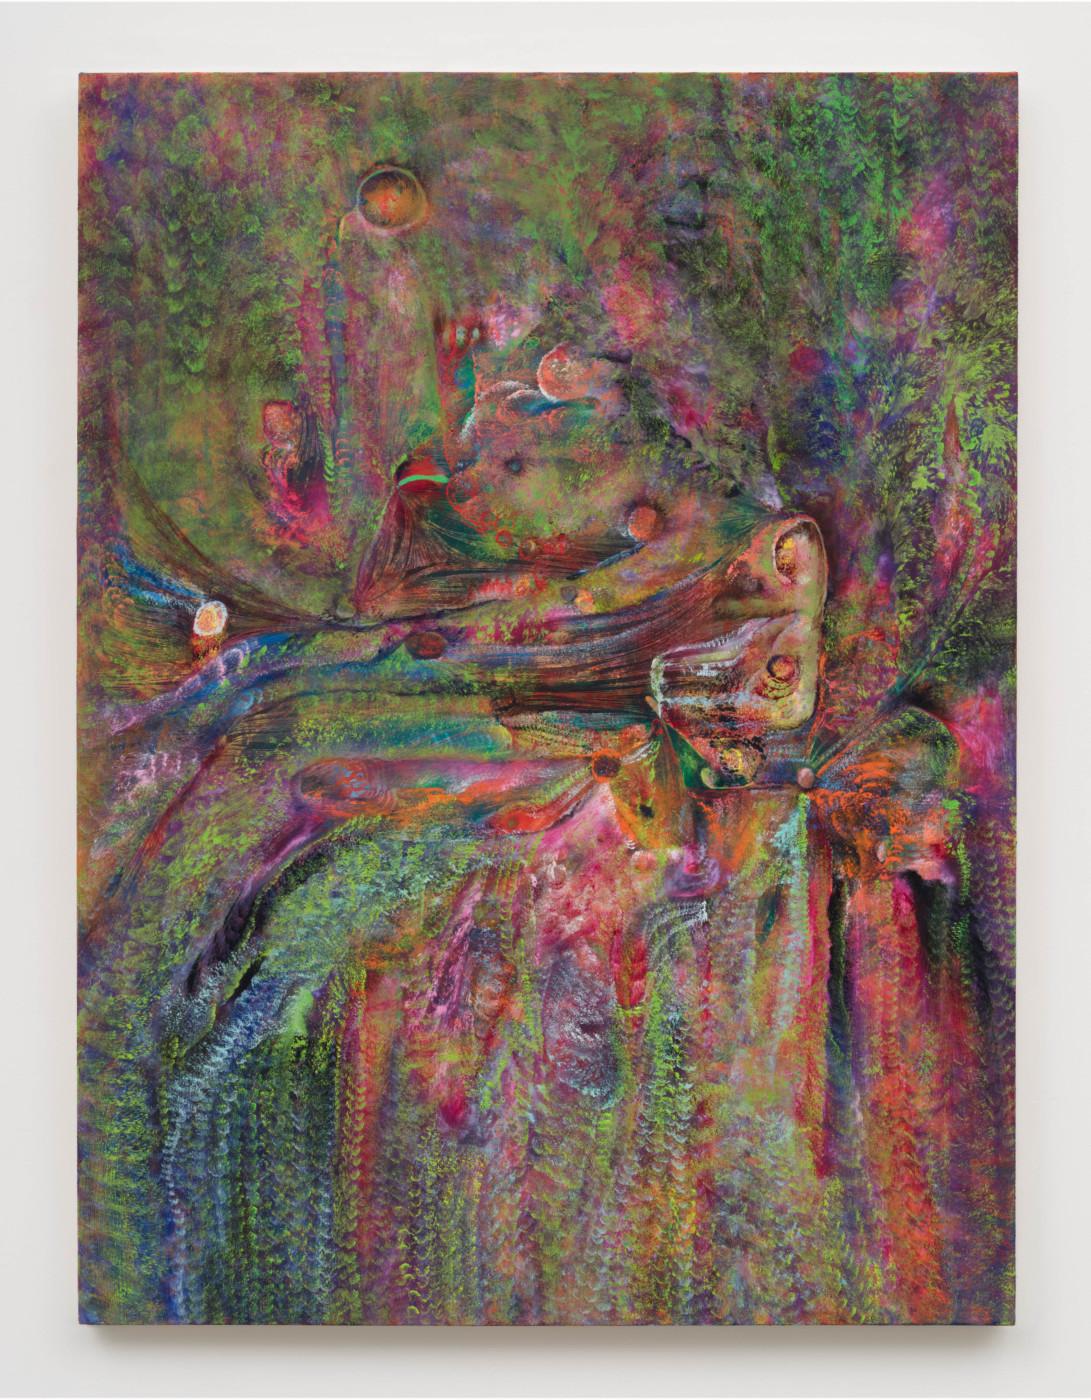 LUCY BULL  Crooked Coda , 2020 Oil on linen 121,9 x 91,4 x 3,8 cm / 48 x 36 x 1 1/2 in - High Art Gallery Paris